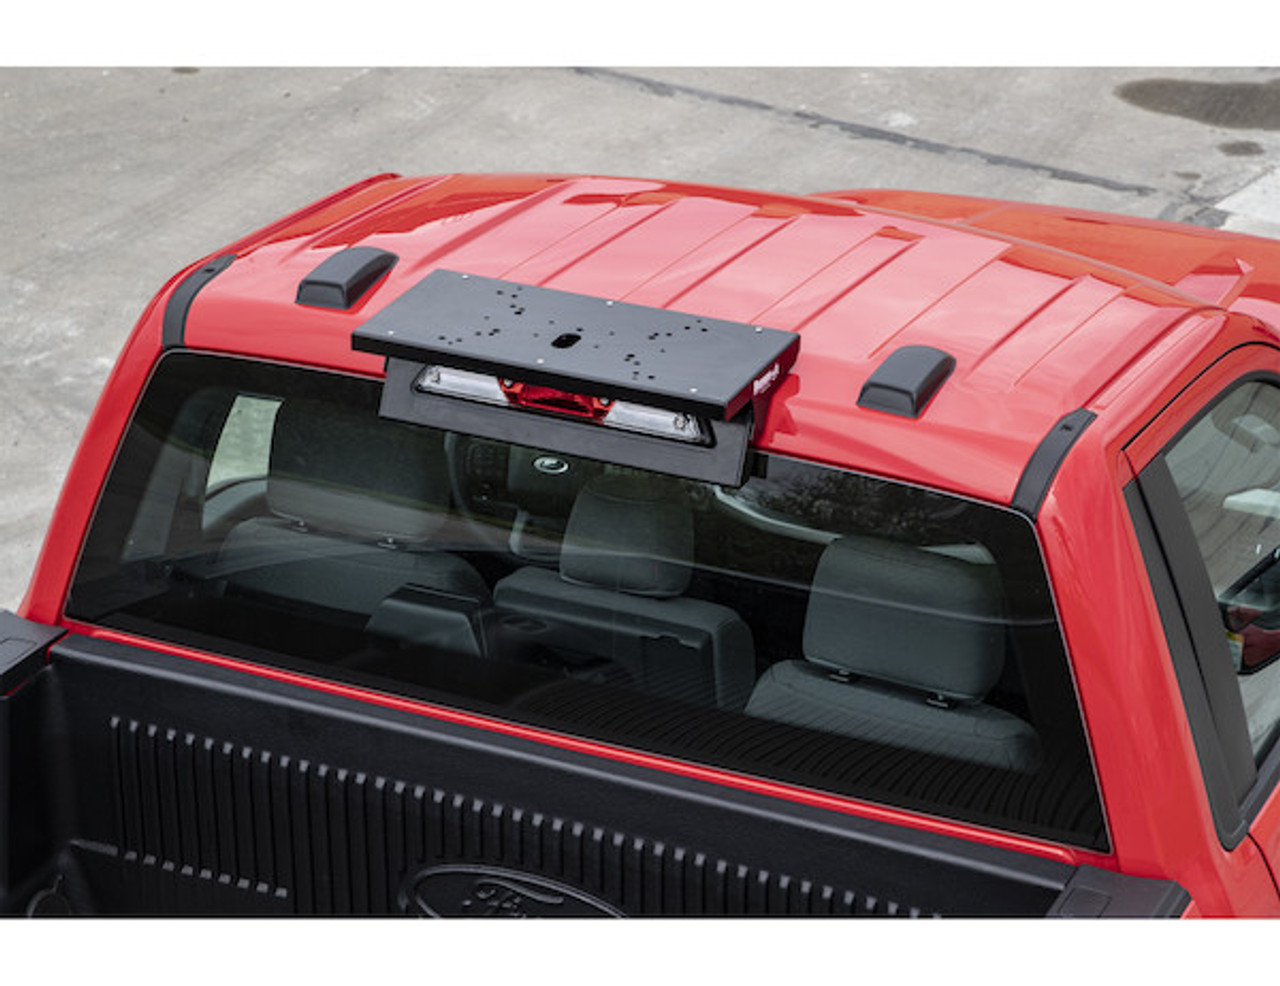 8895560 --- Fleet Series Drill-Free Light Bar Cab Mount - Ford